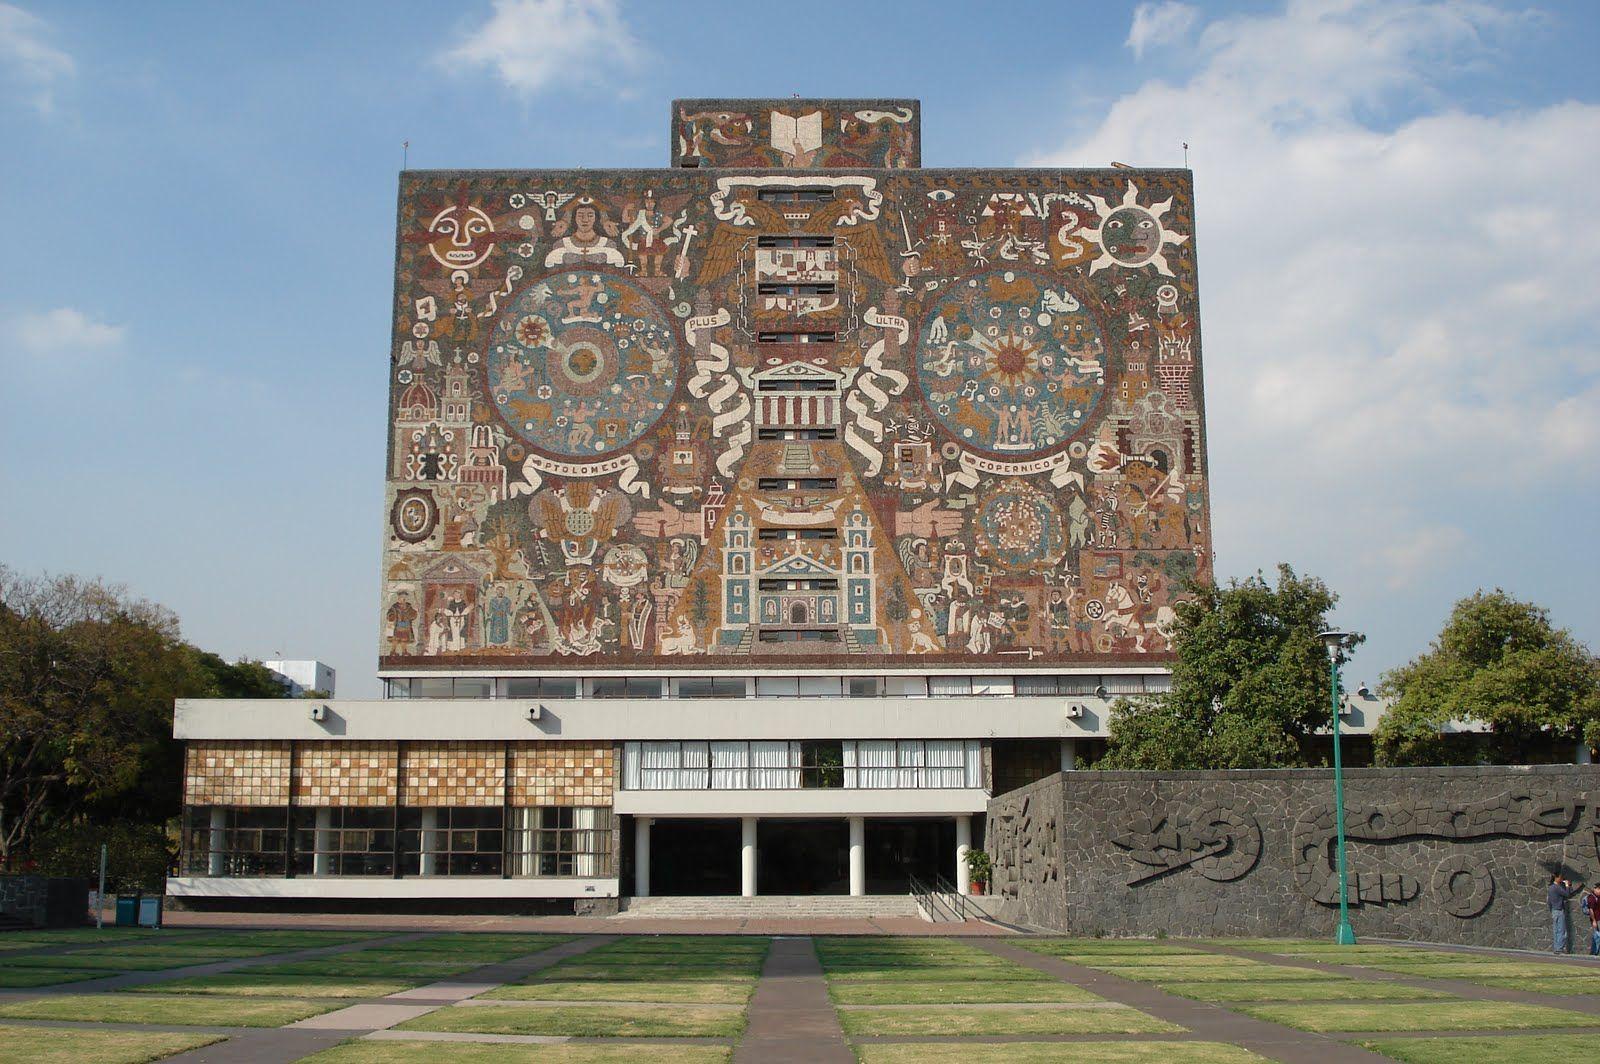 Central Library Unam Mexico City Tours Mexico City University City